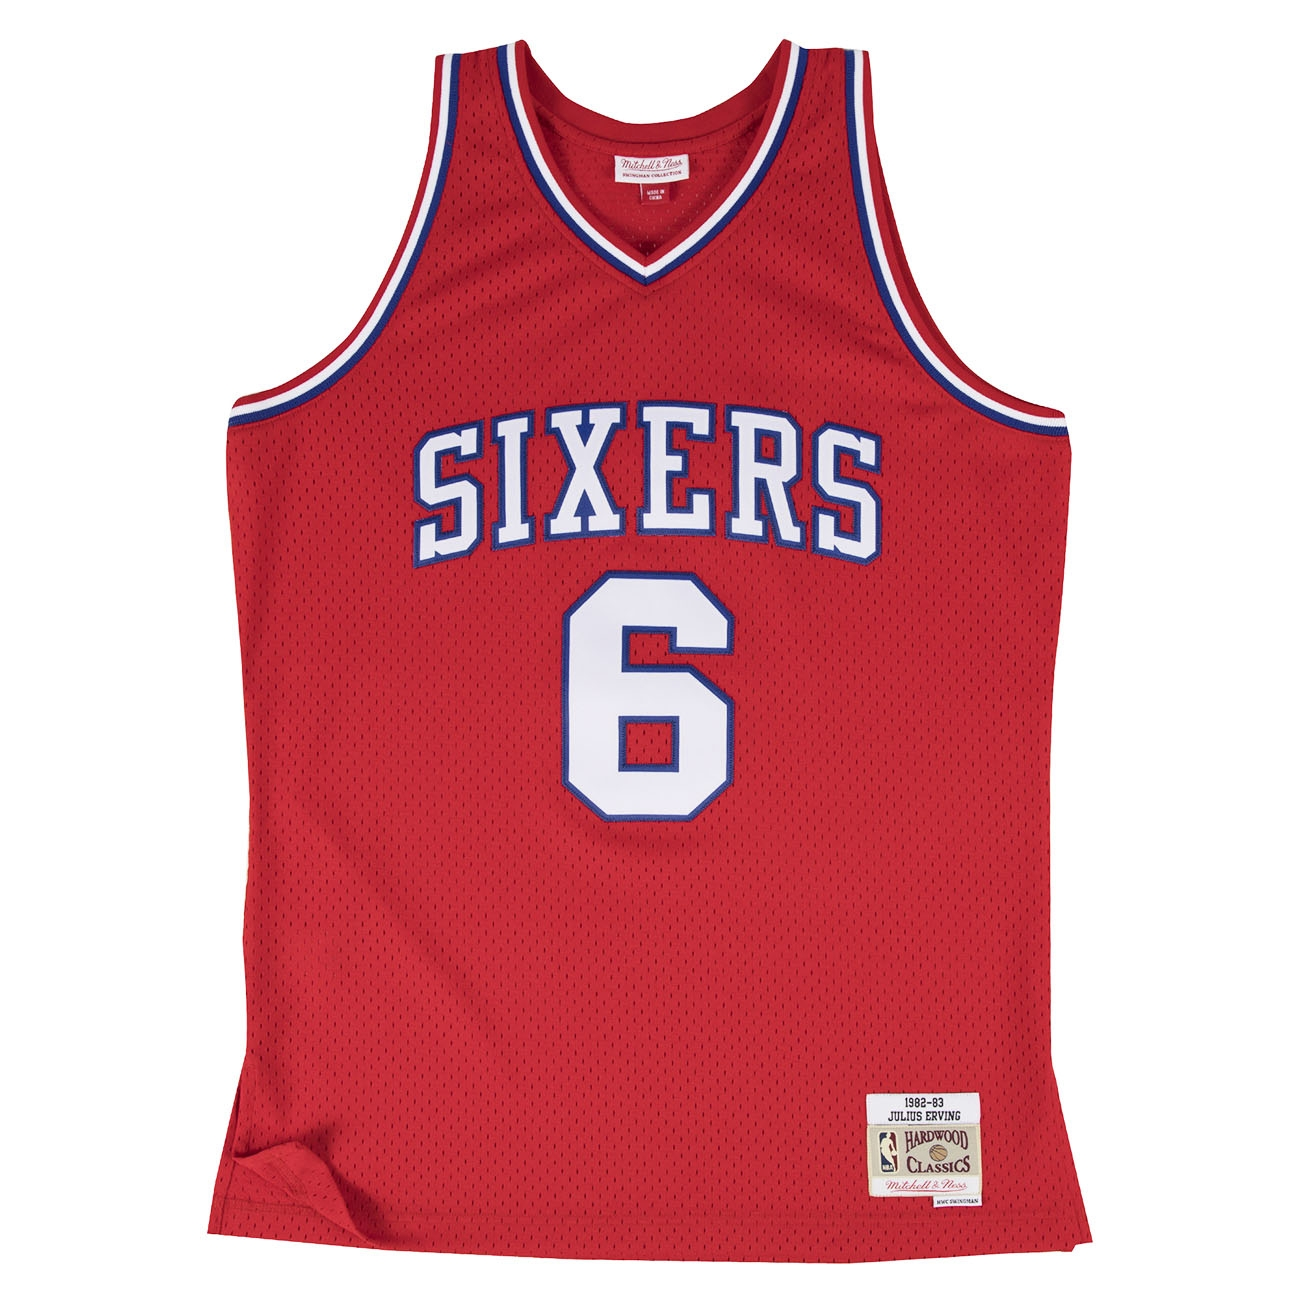 new product 8a2ef 812ca Mitchell   Ness Julius Erving  6 Philadelphia 76ers 1982-83 Swingman NBA  Jersey RED   TAASS.com Fan Shop